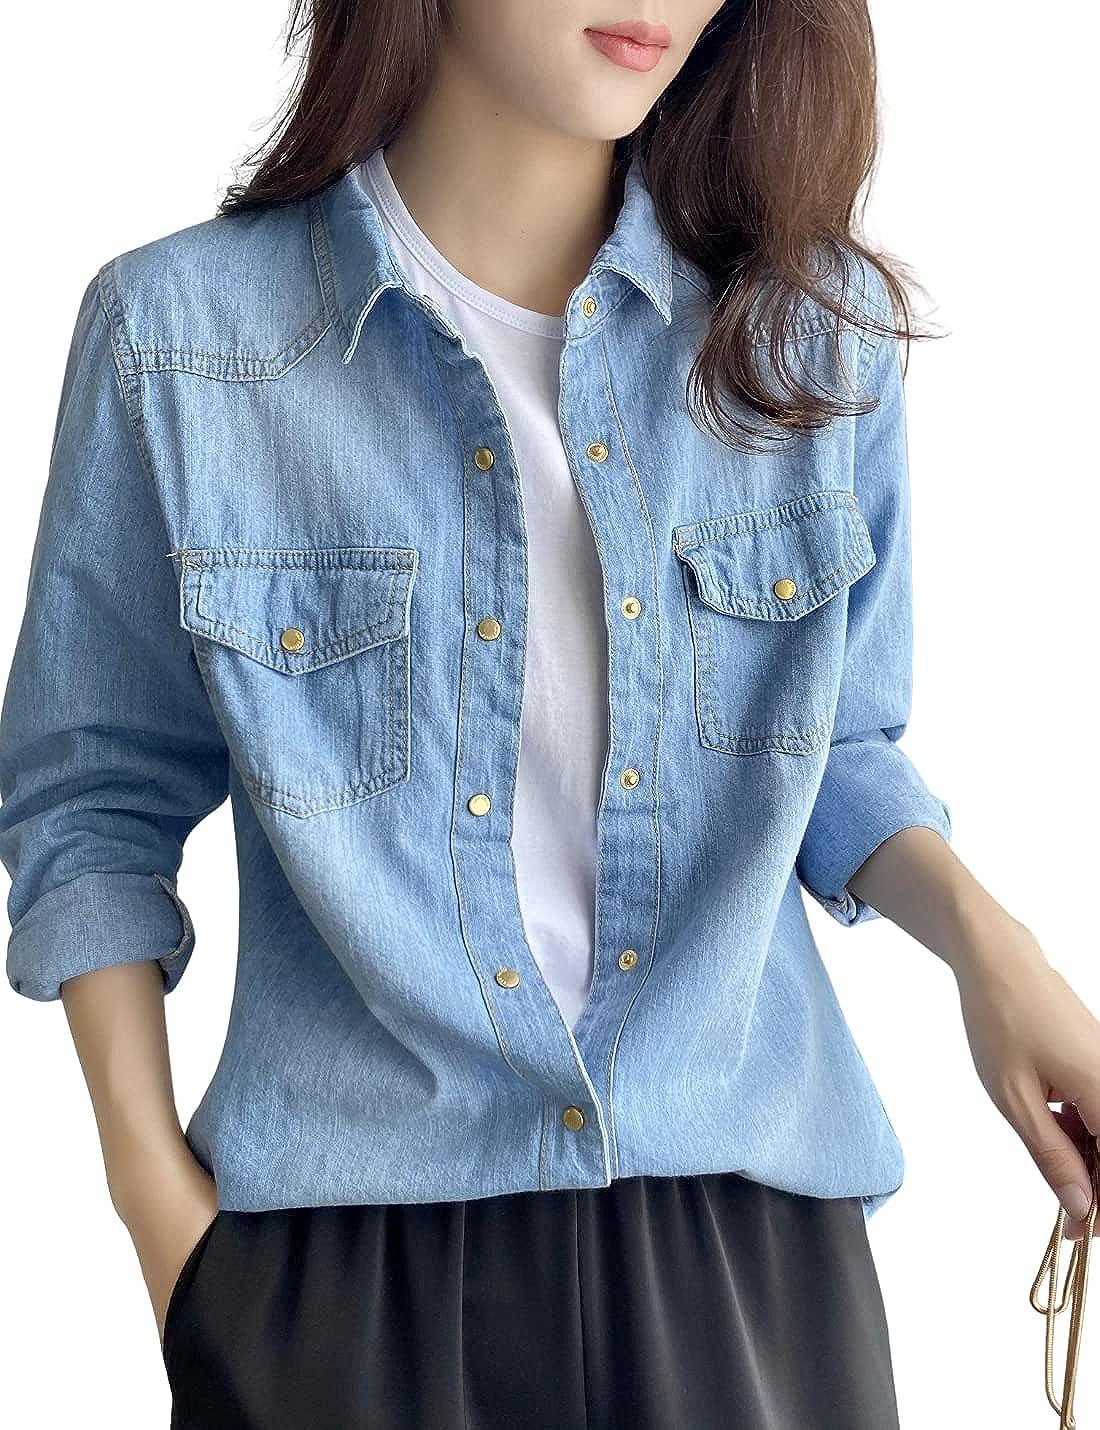 InterNos Women's Basic Denim Shirt Classic Sleeve Long Do Our shop most popular San Diego Mall Button